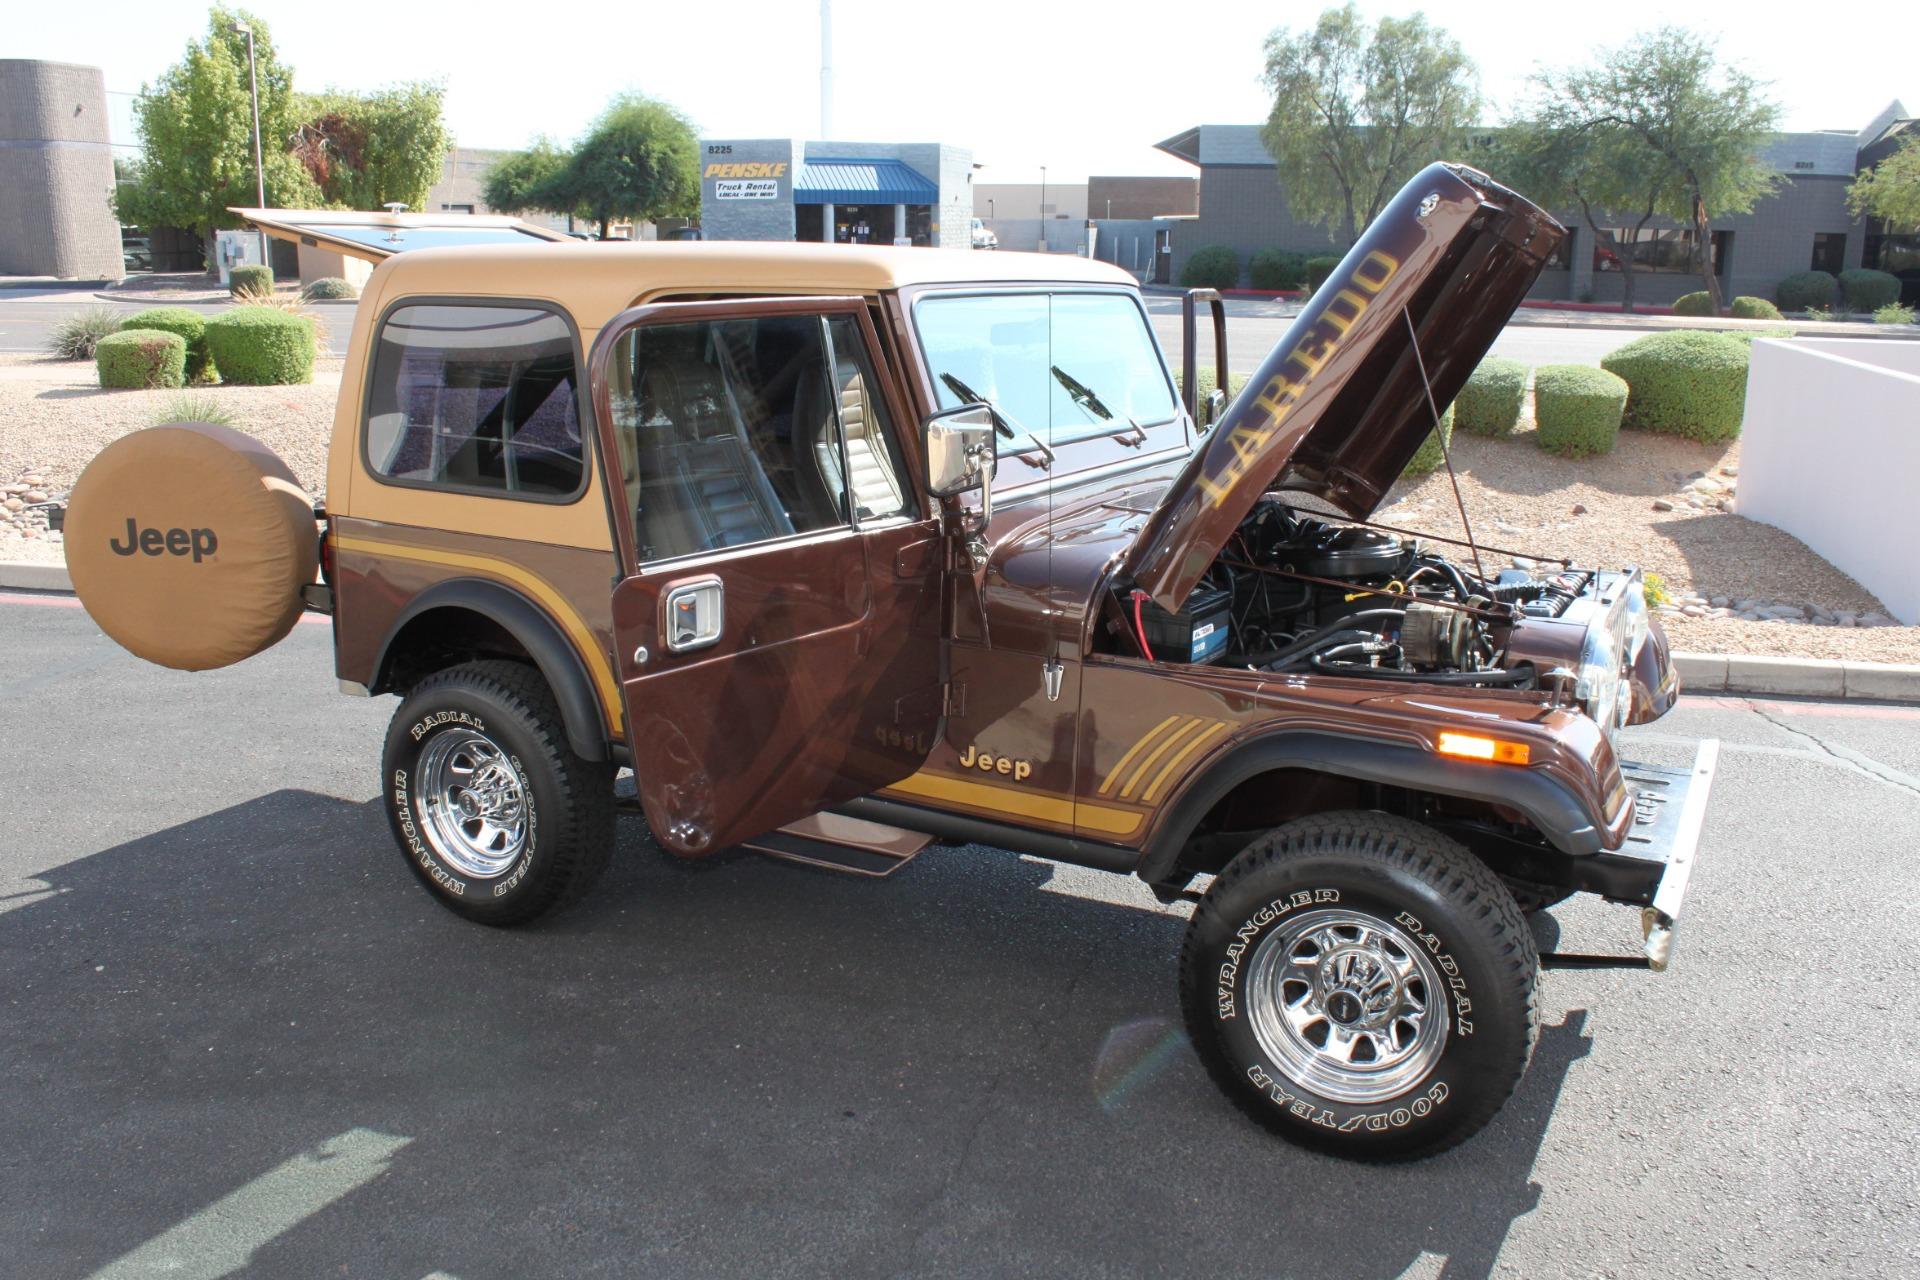 Used-1985-Jeep-CJ-7-Laredo-4WD-Ford